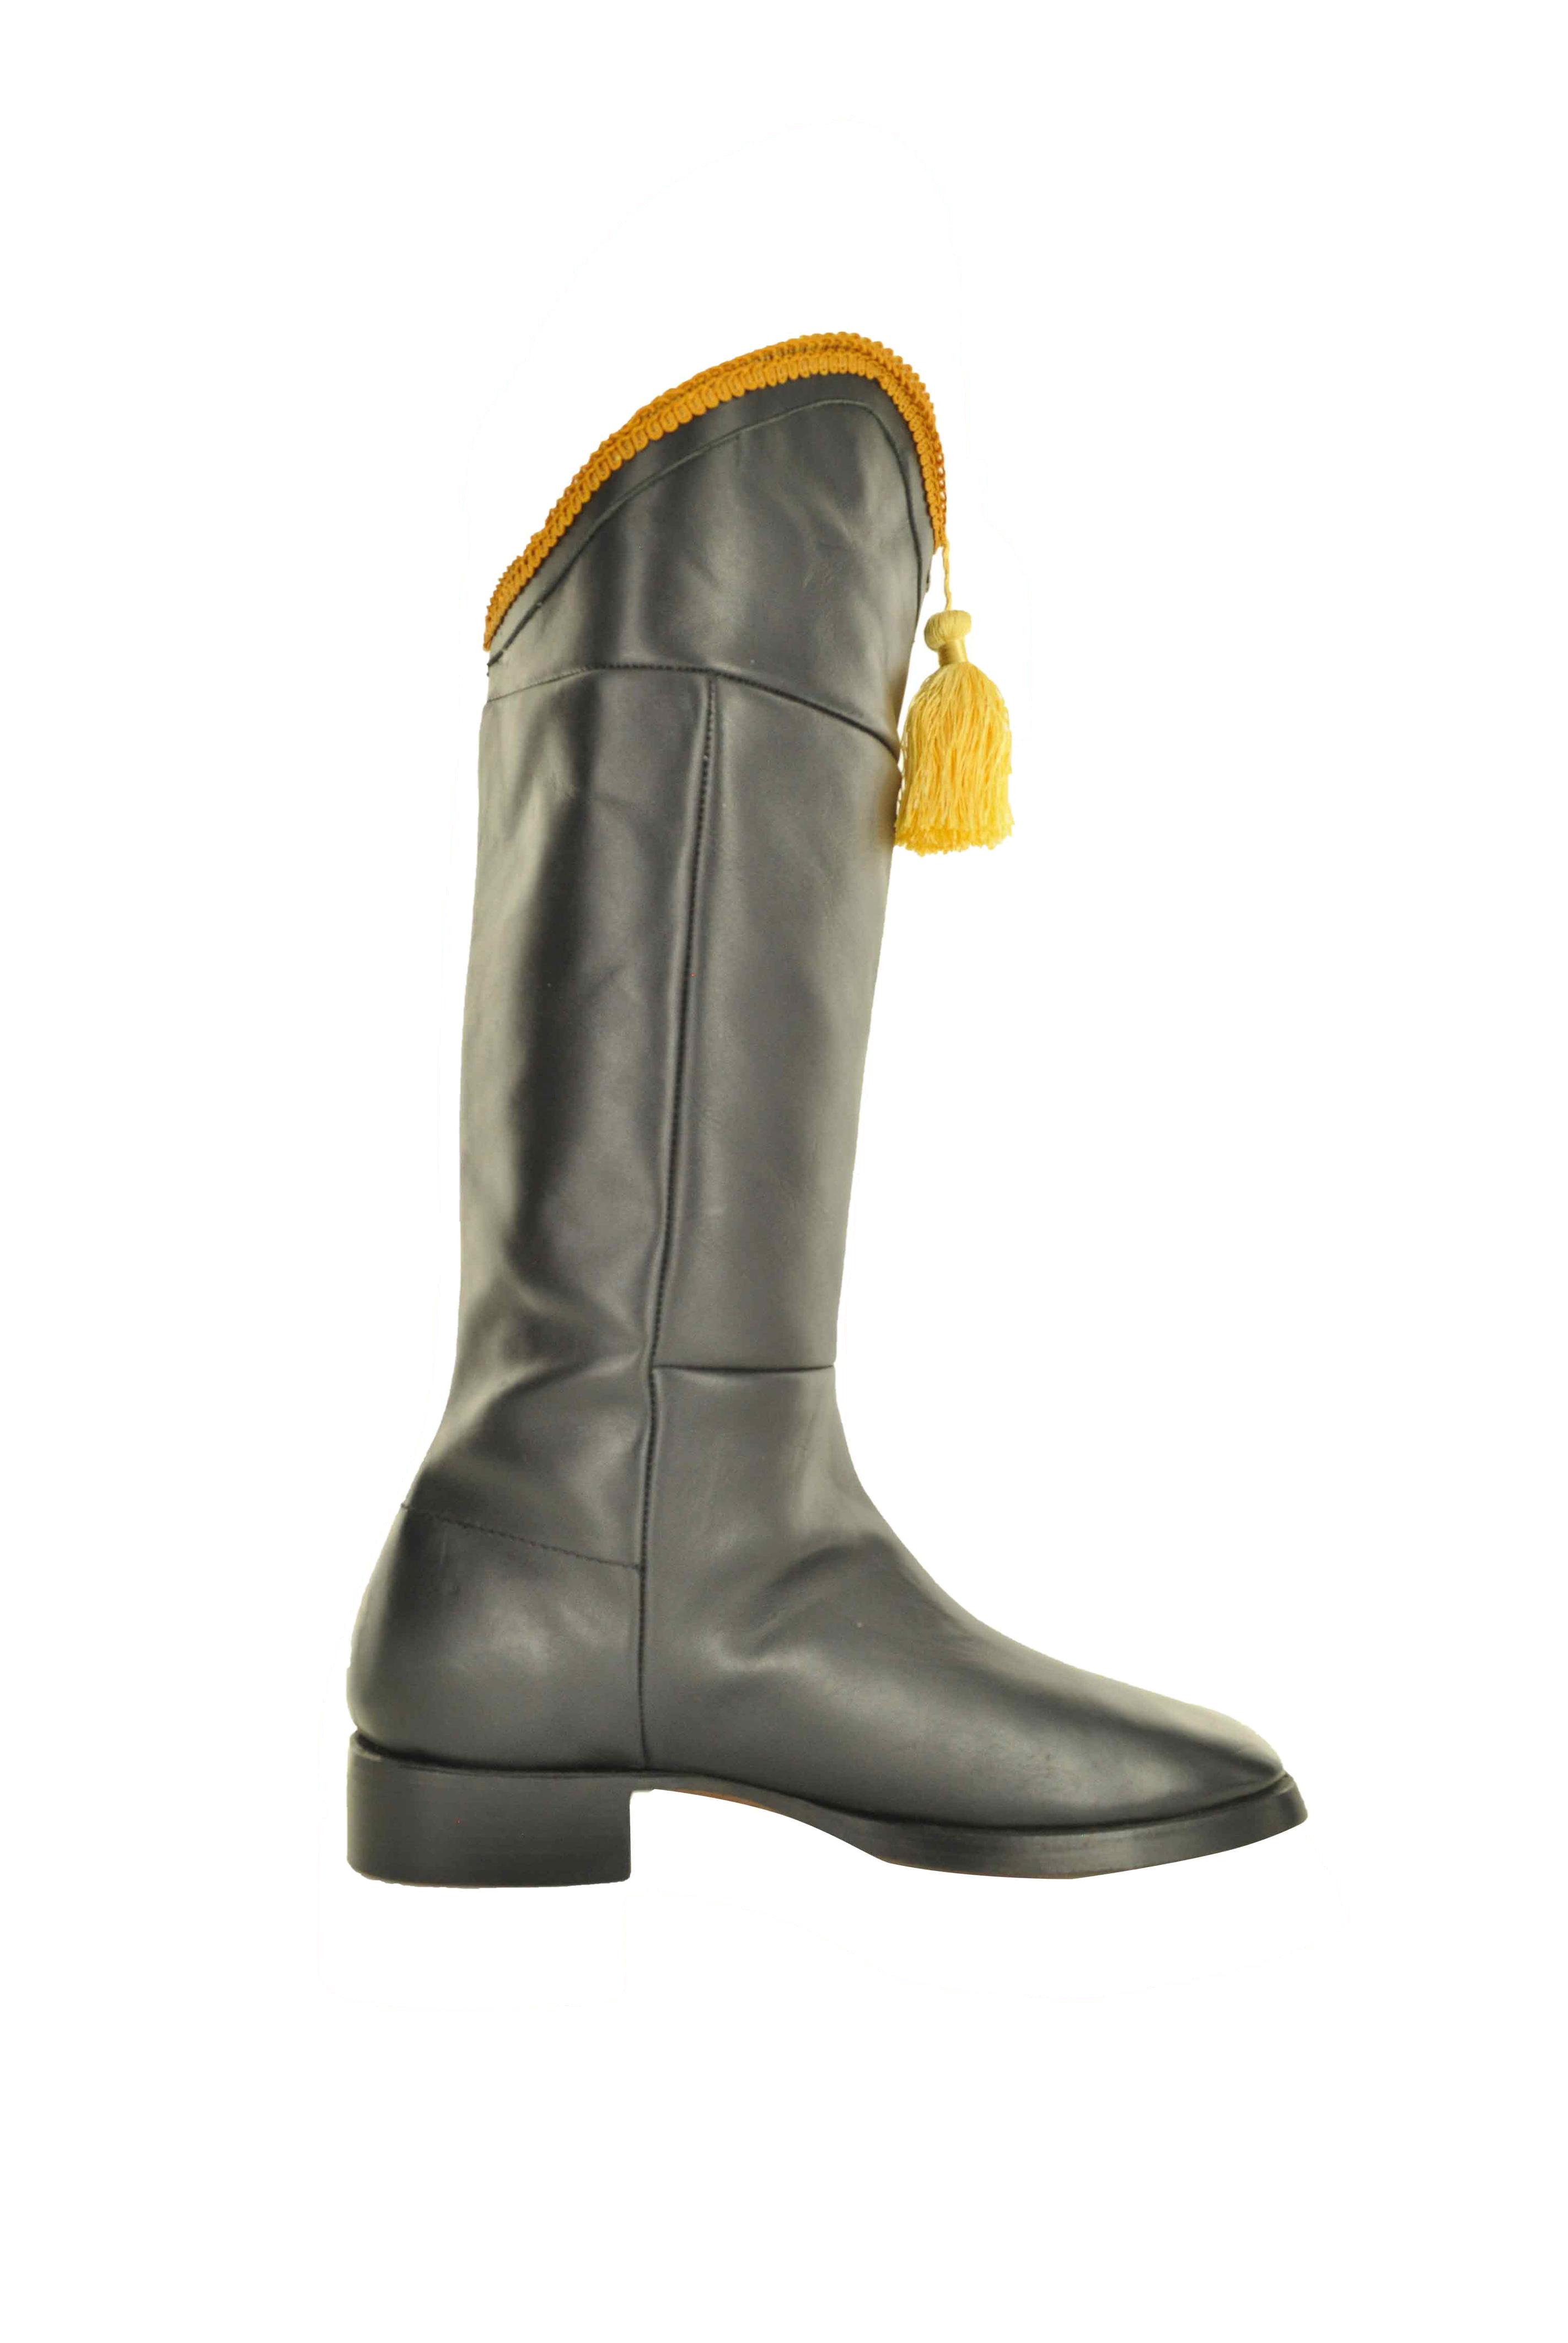 Fugawee's Hessian boot